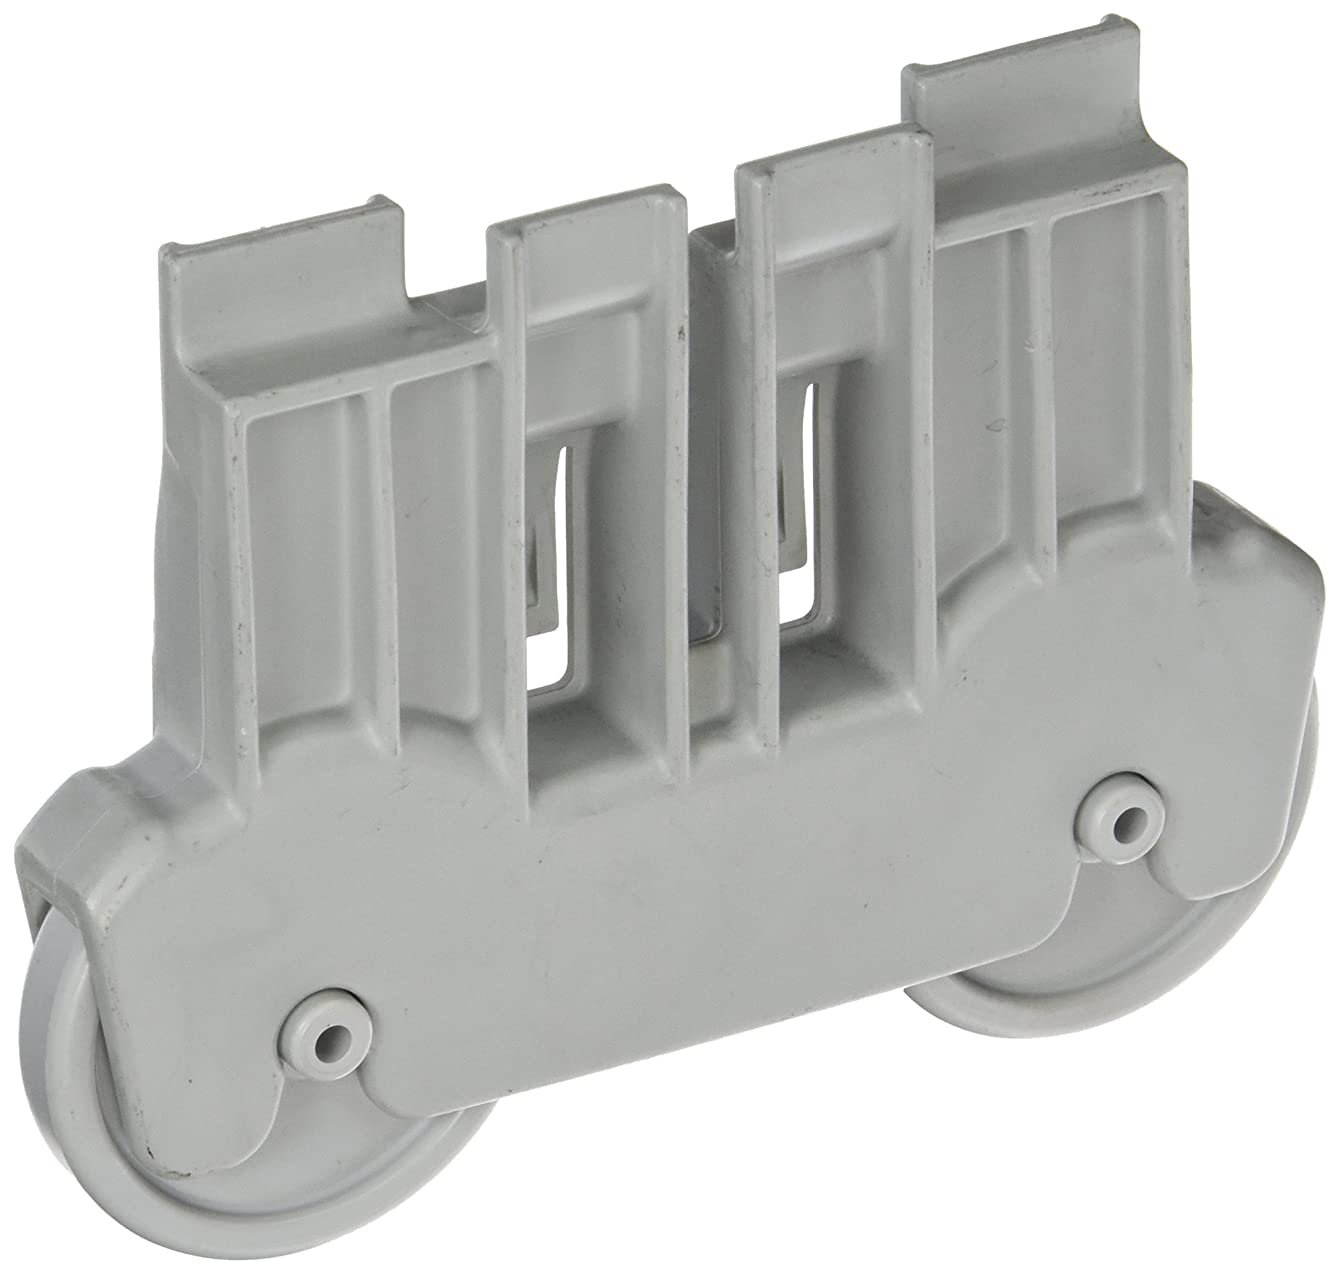 GENUINE Frigidaire 154482202 Dishwasher Roller Unit